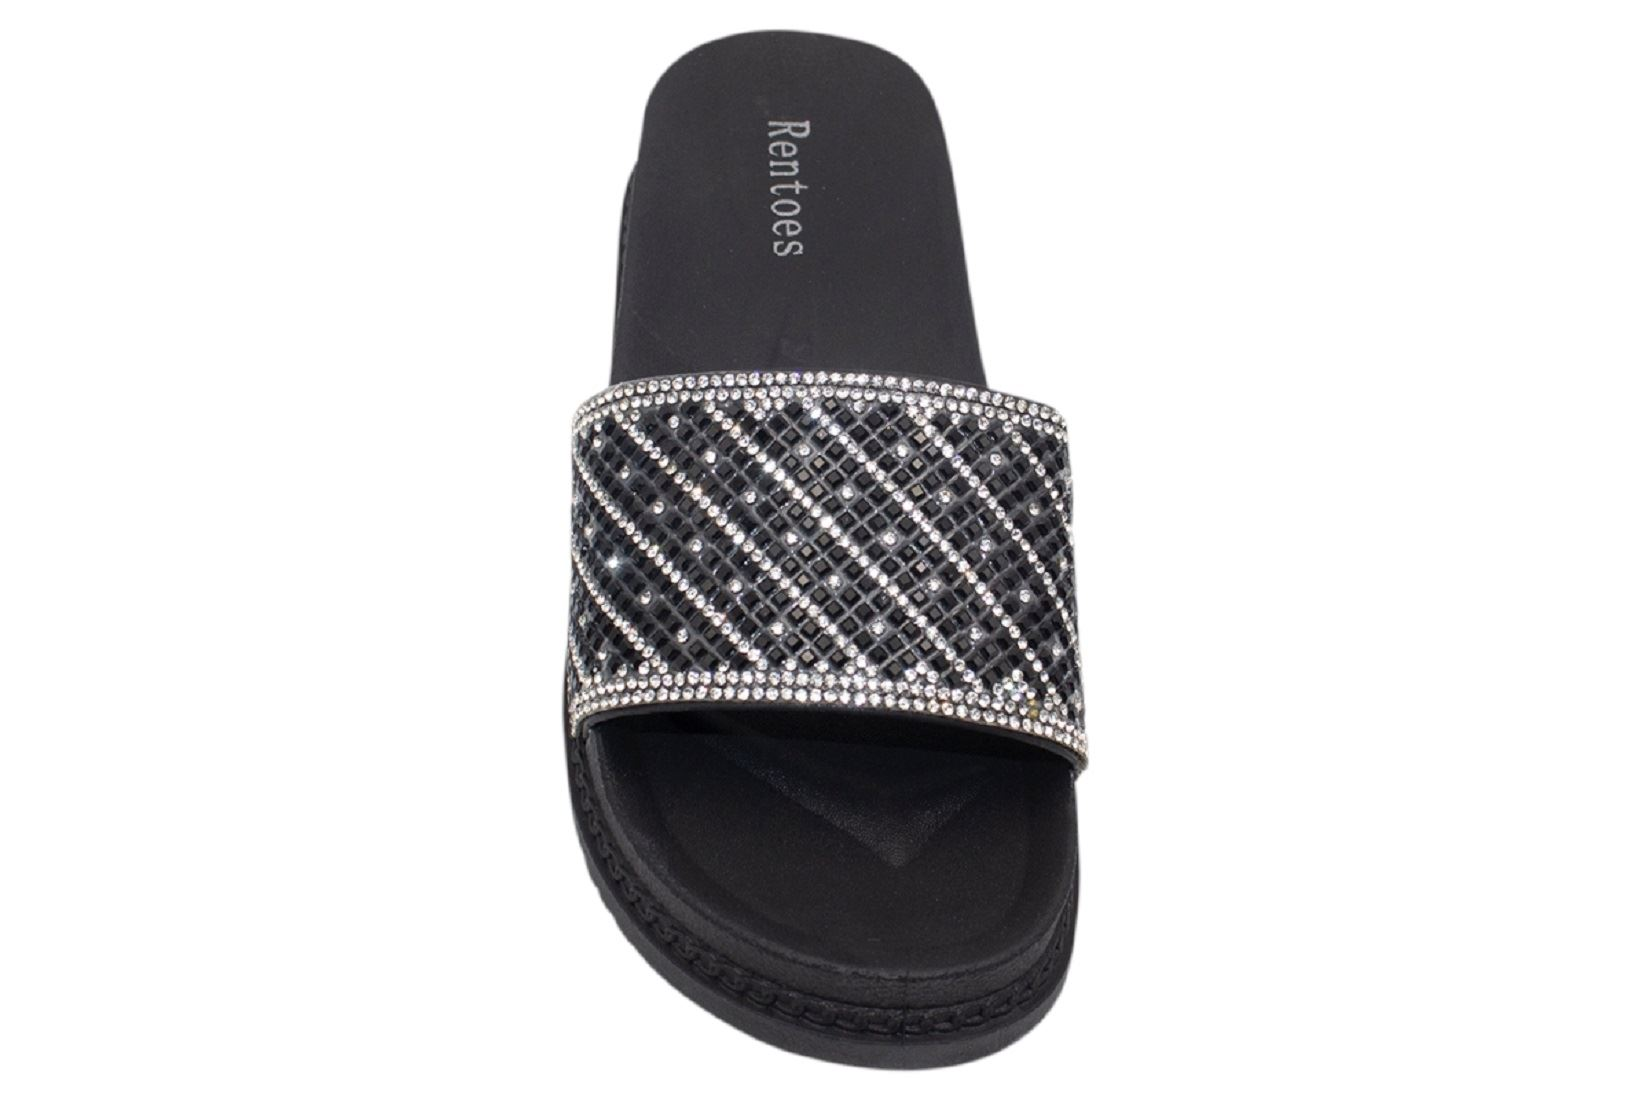 Womens-Sliders-Casual-Slippers-Mules-Ladies-Diamante-Flip-Flop-Sandals-Shoes thumbnail 78